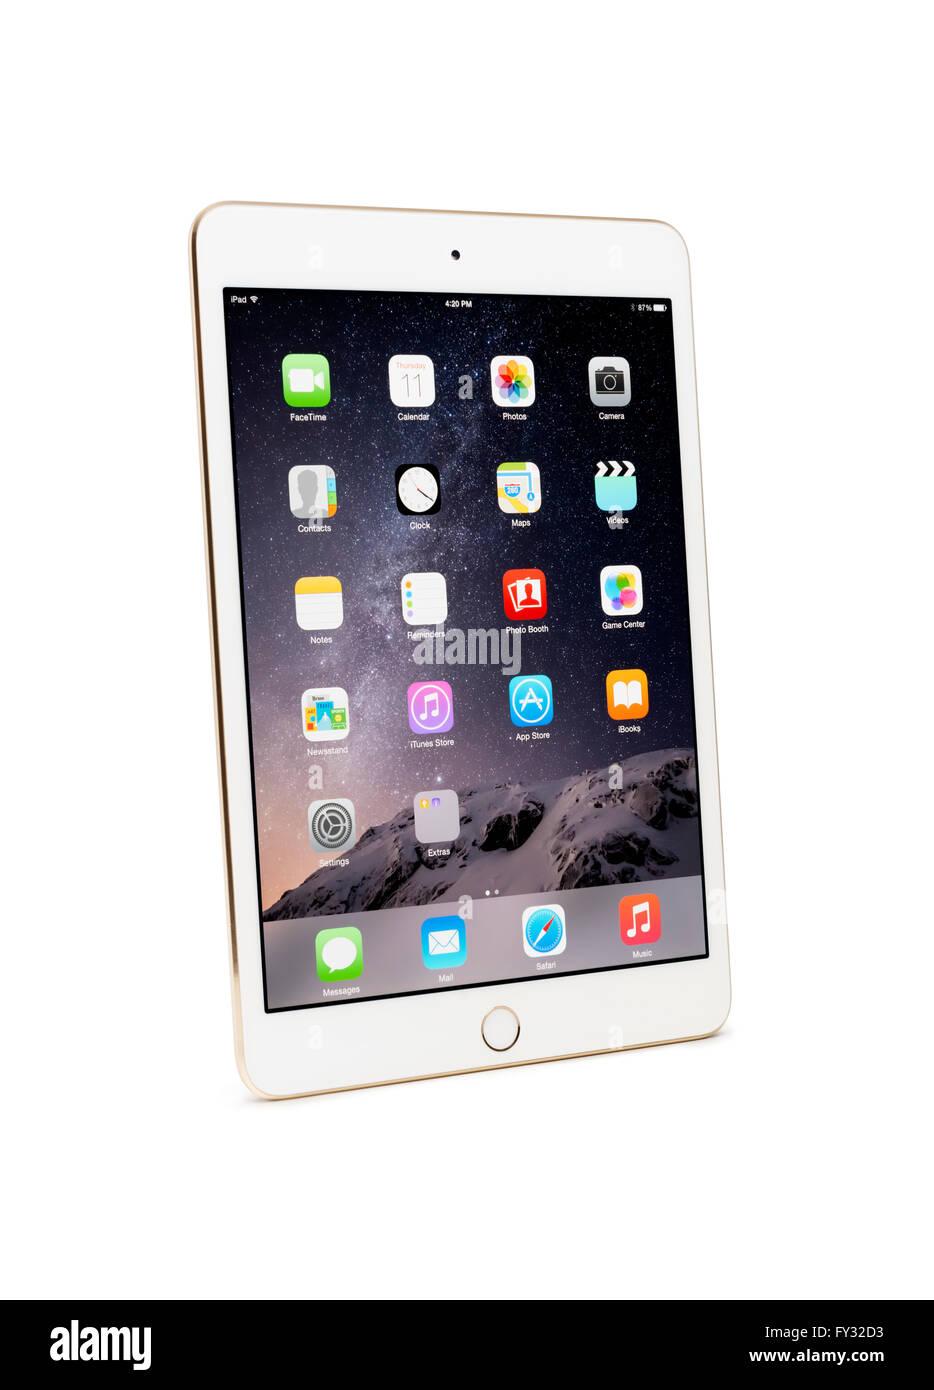 White gold Apple iPad Mini 3 tablet computer - Stock Image